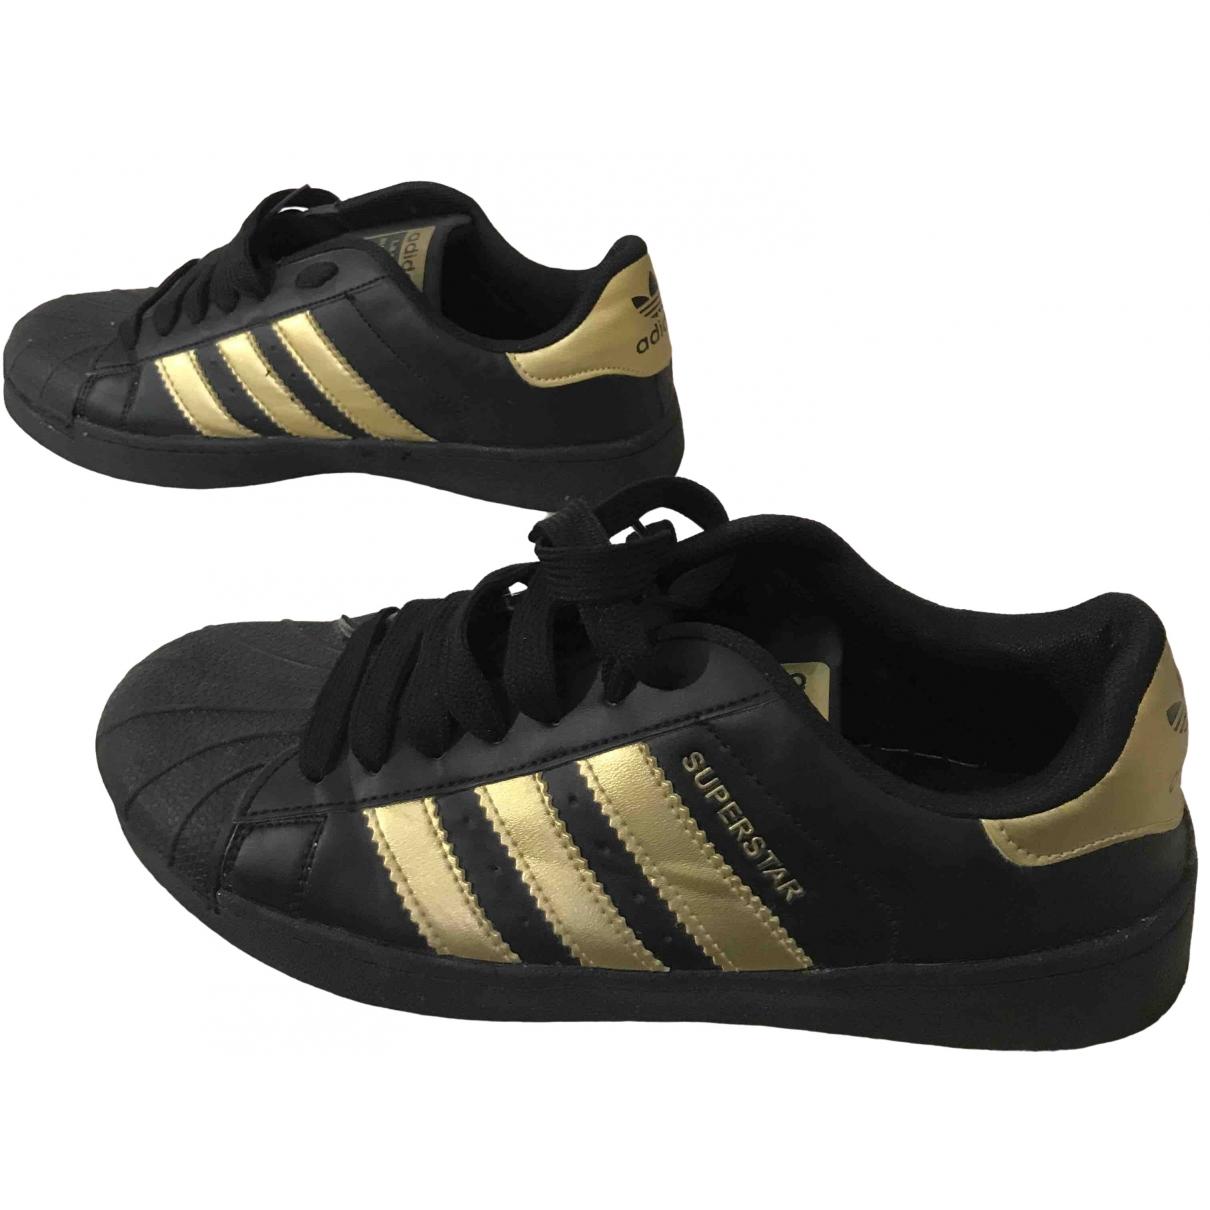 Adidas Stan Smith Sneakers in  Beige Leder